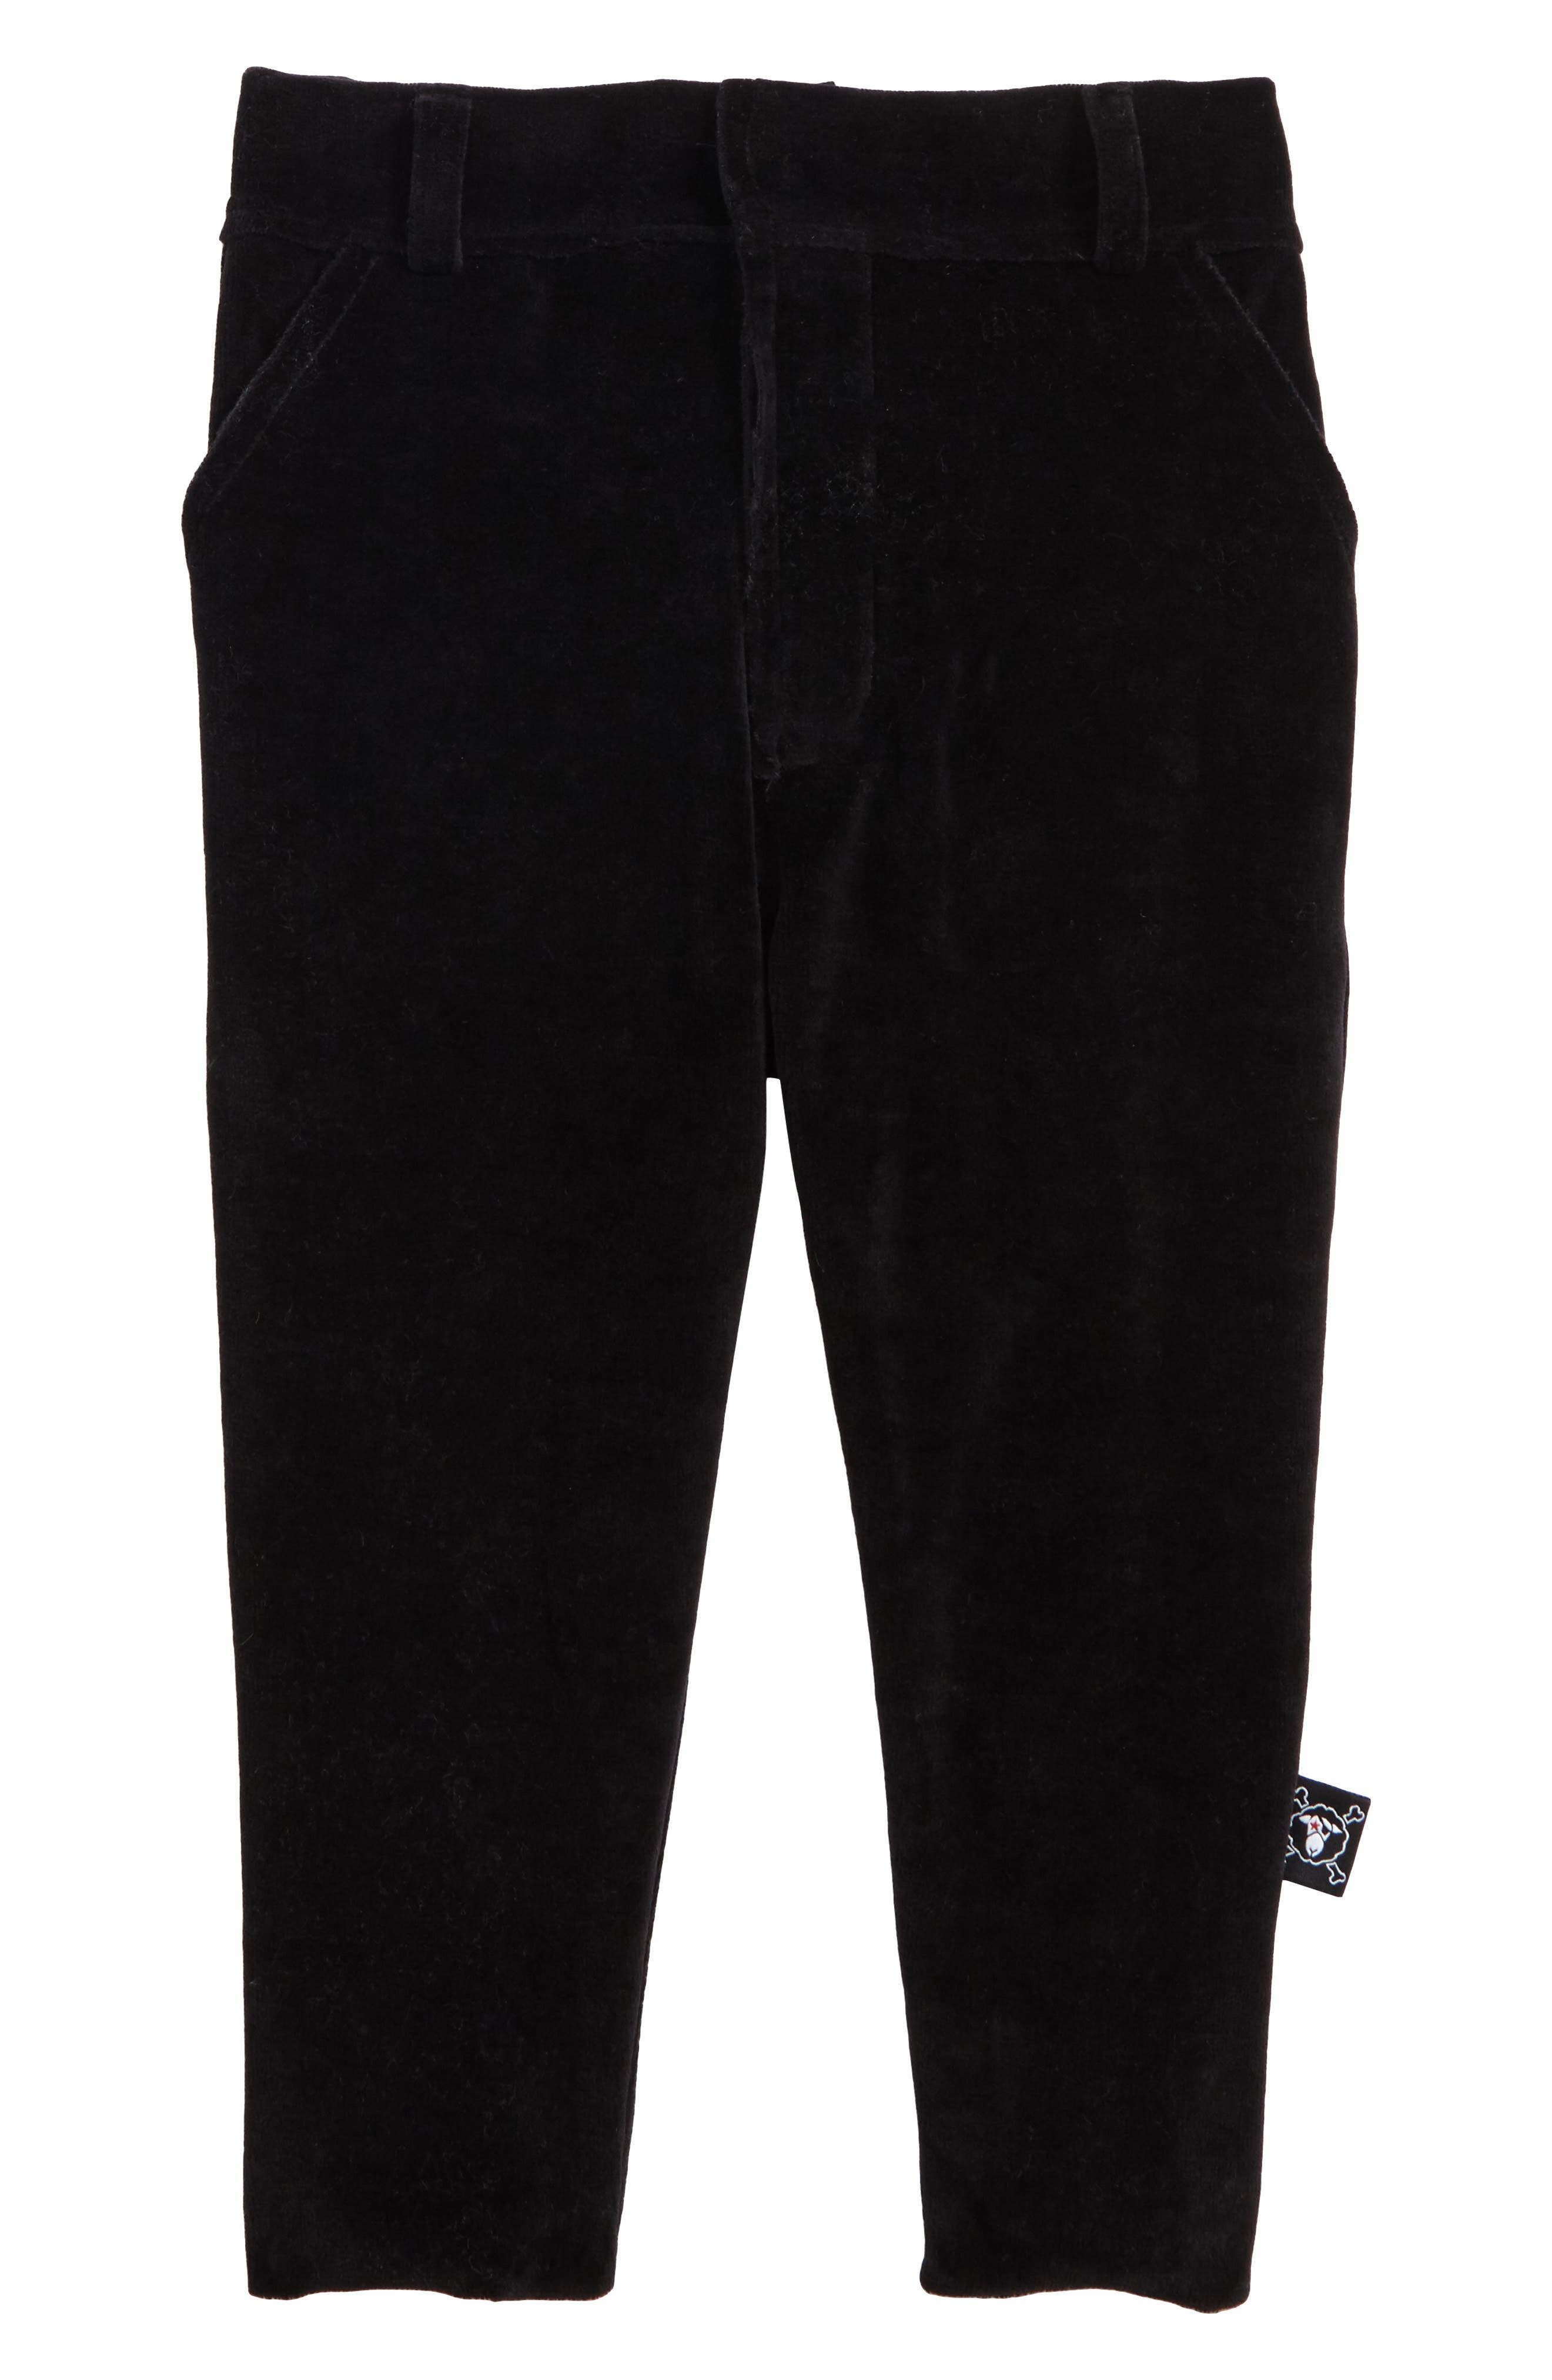 Velvet Pants,                         Main,                         color, 001